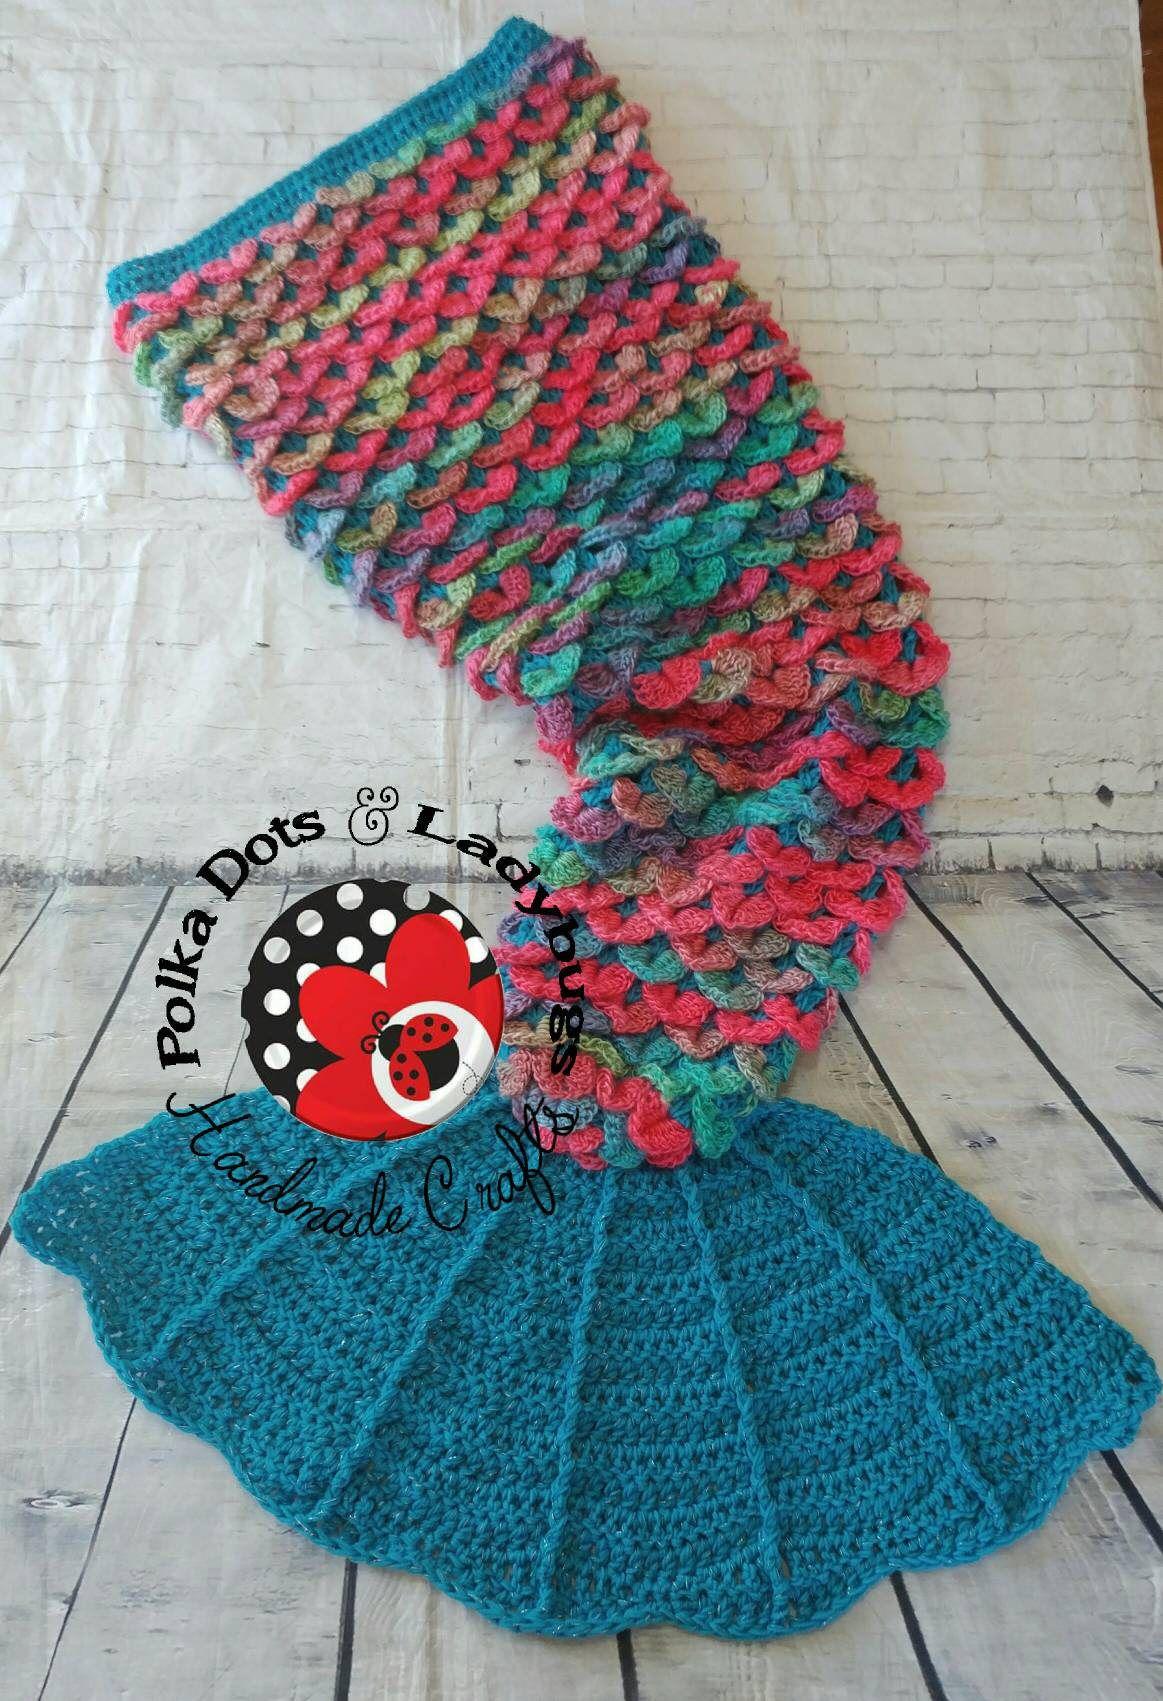 Pin de Sharon Pryke en crochet | Pinterest | Manta, Tejidos de punto ...